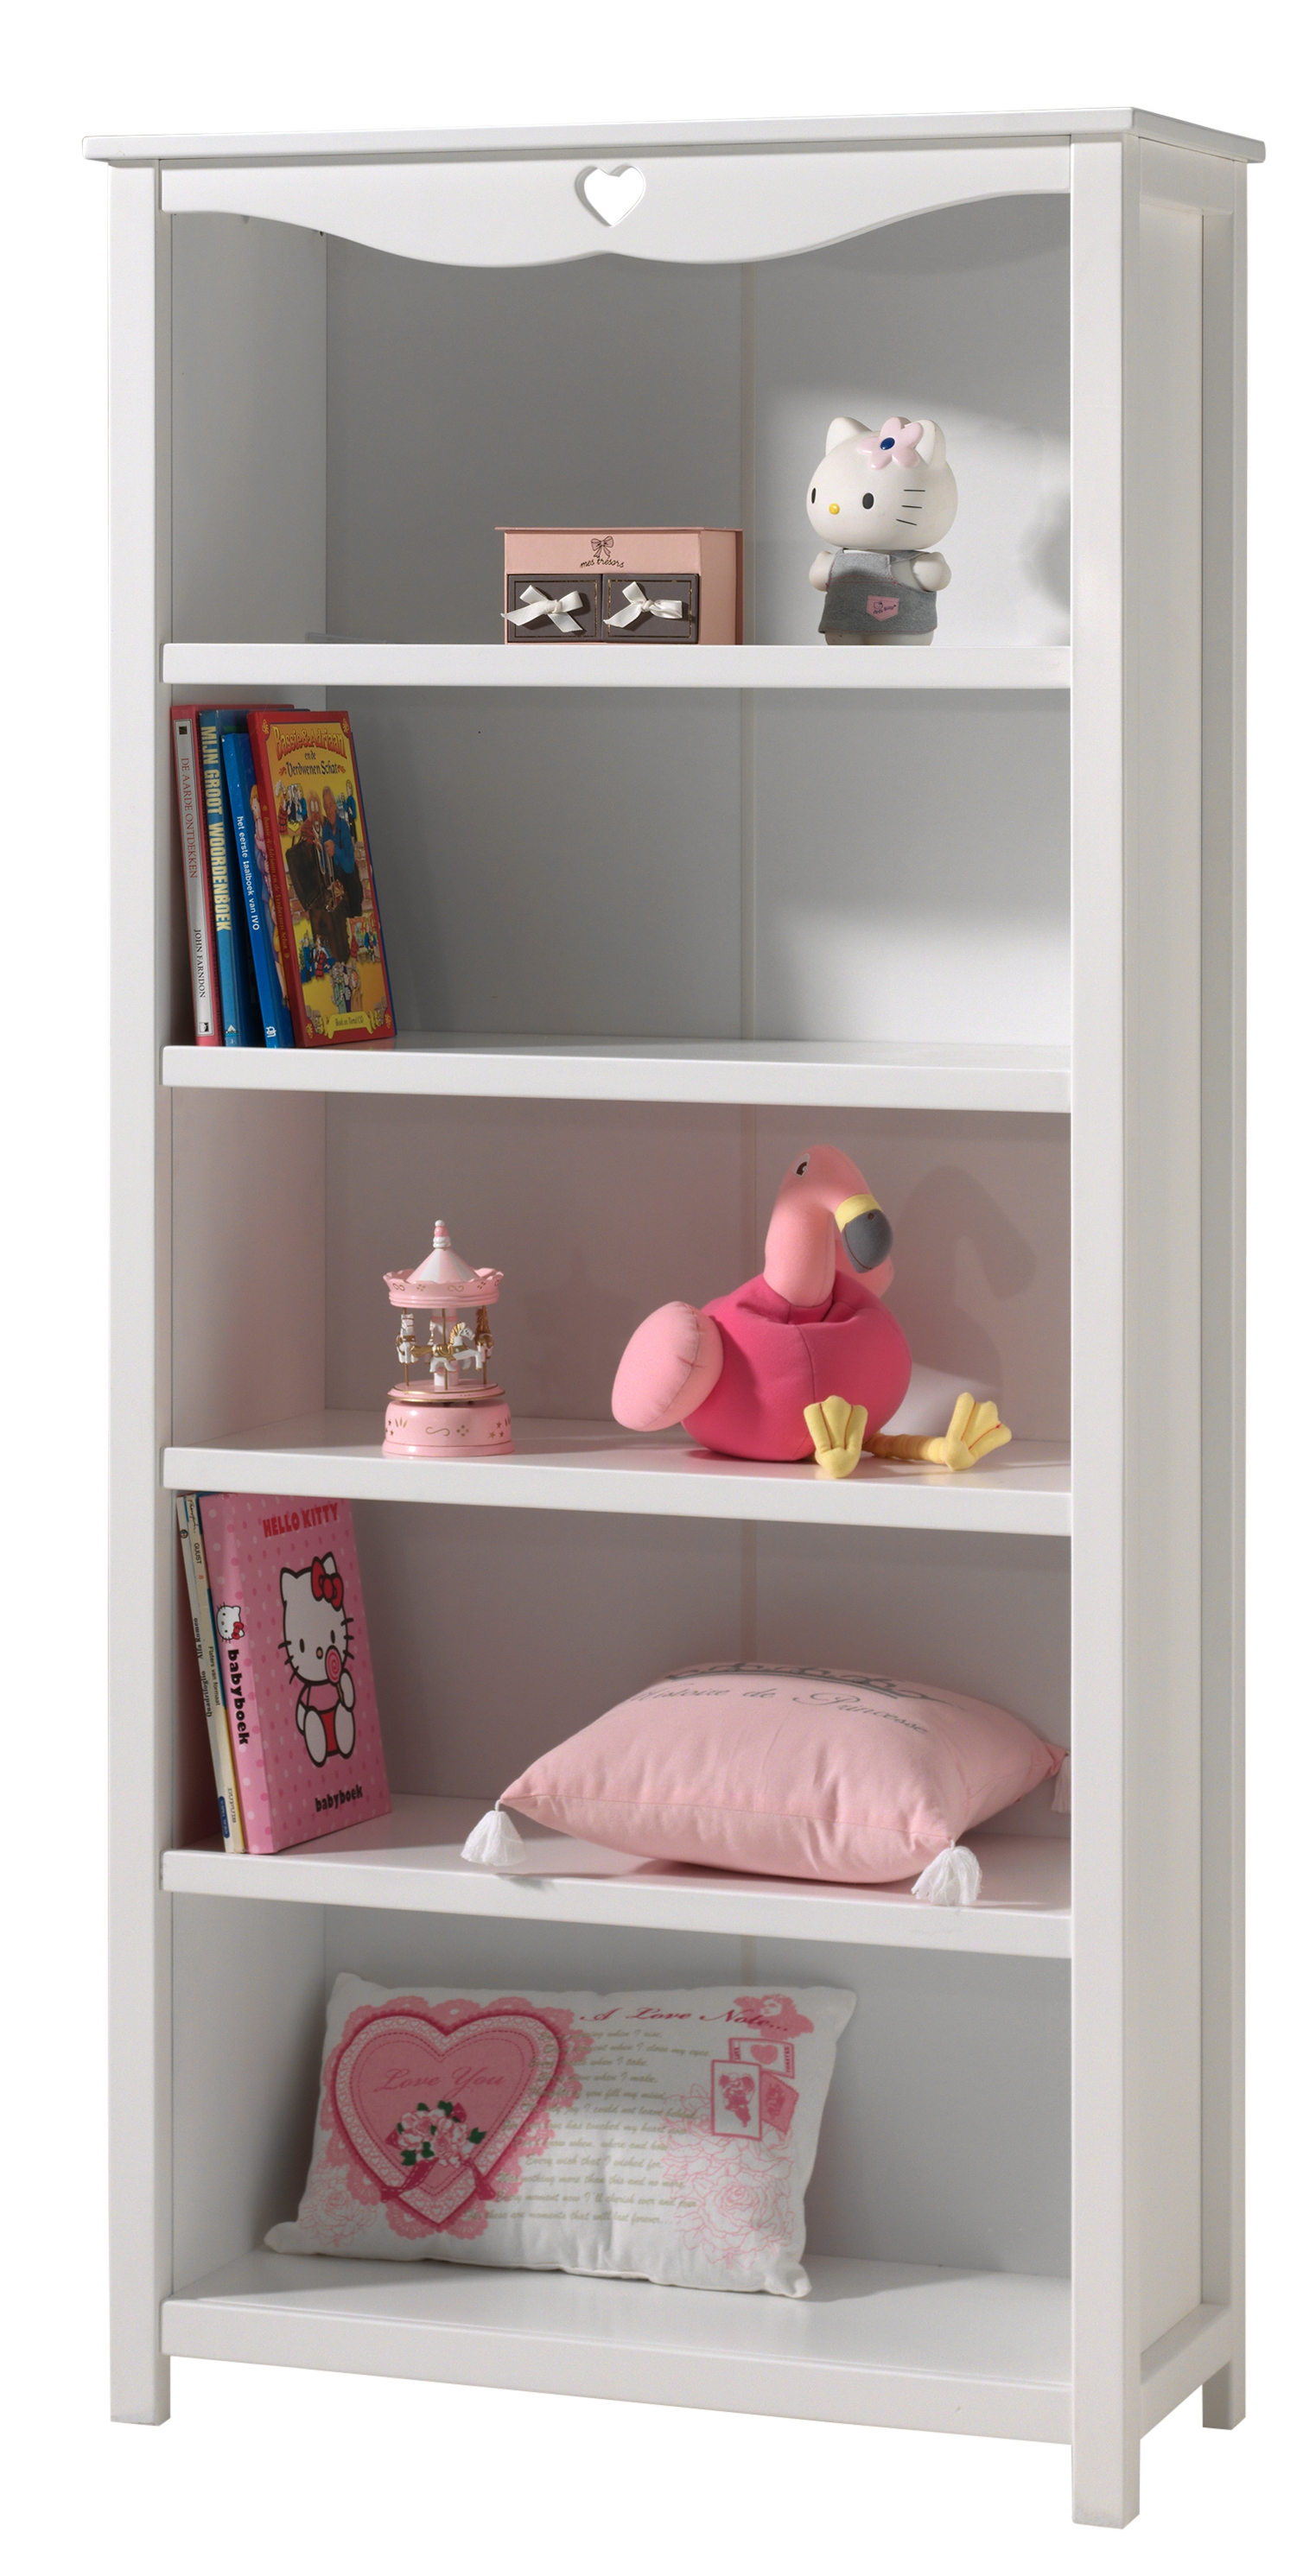 biblioth que laqu blanc coeur. Black Bedroom Furniture Sets. Home Design Ideas